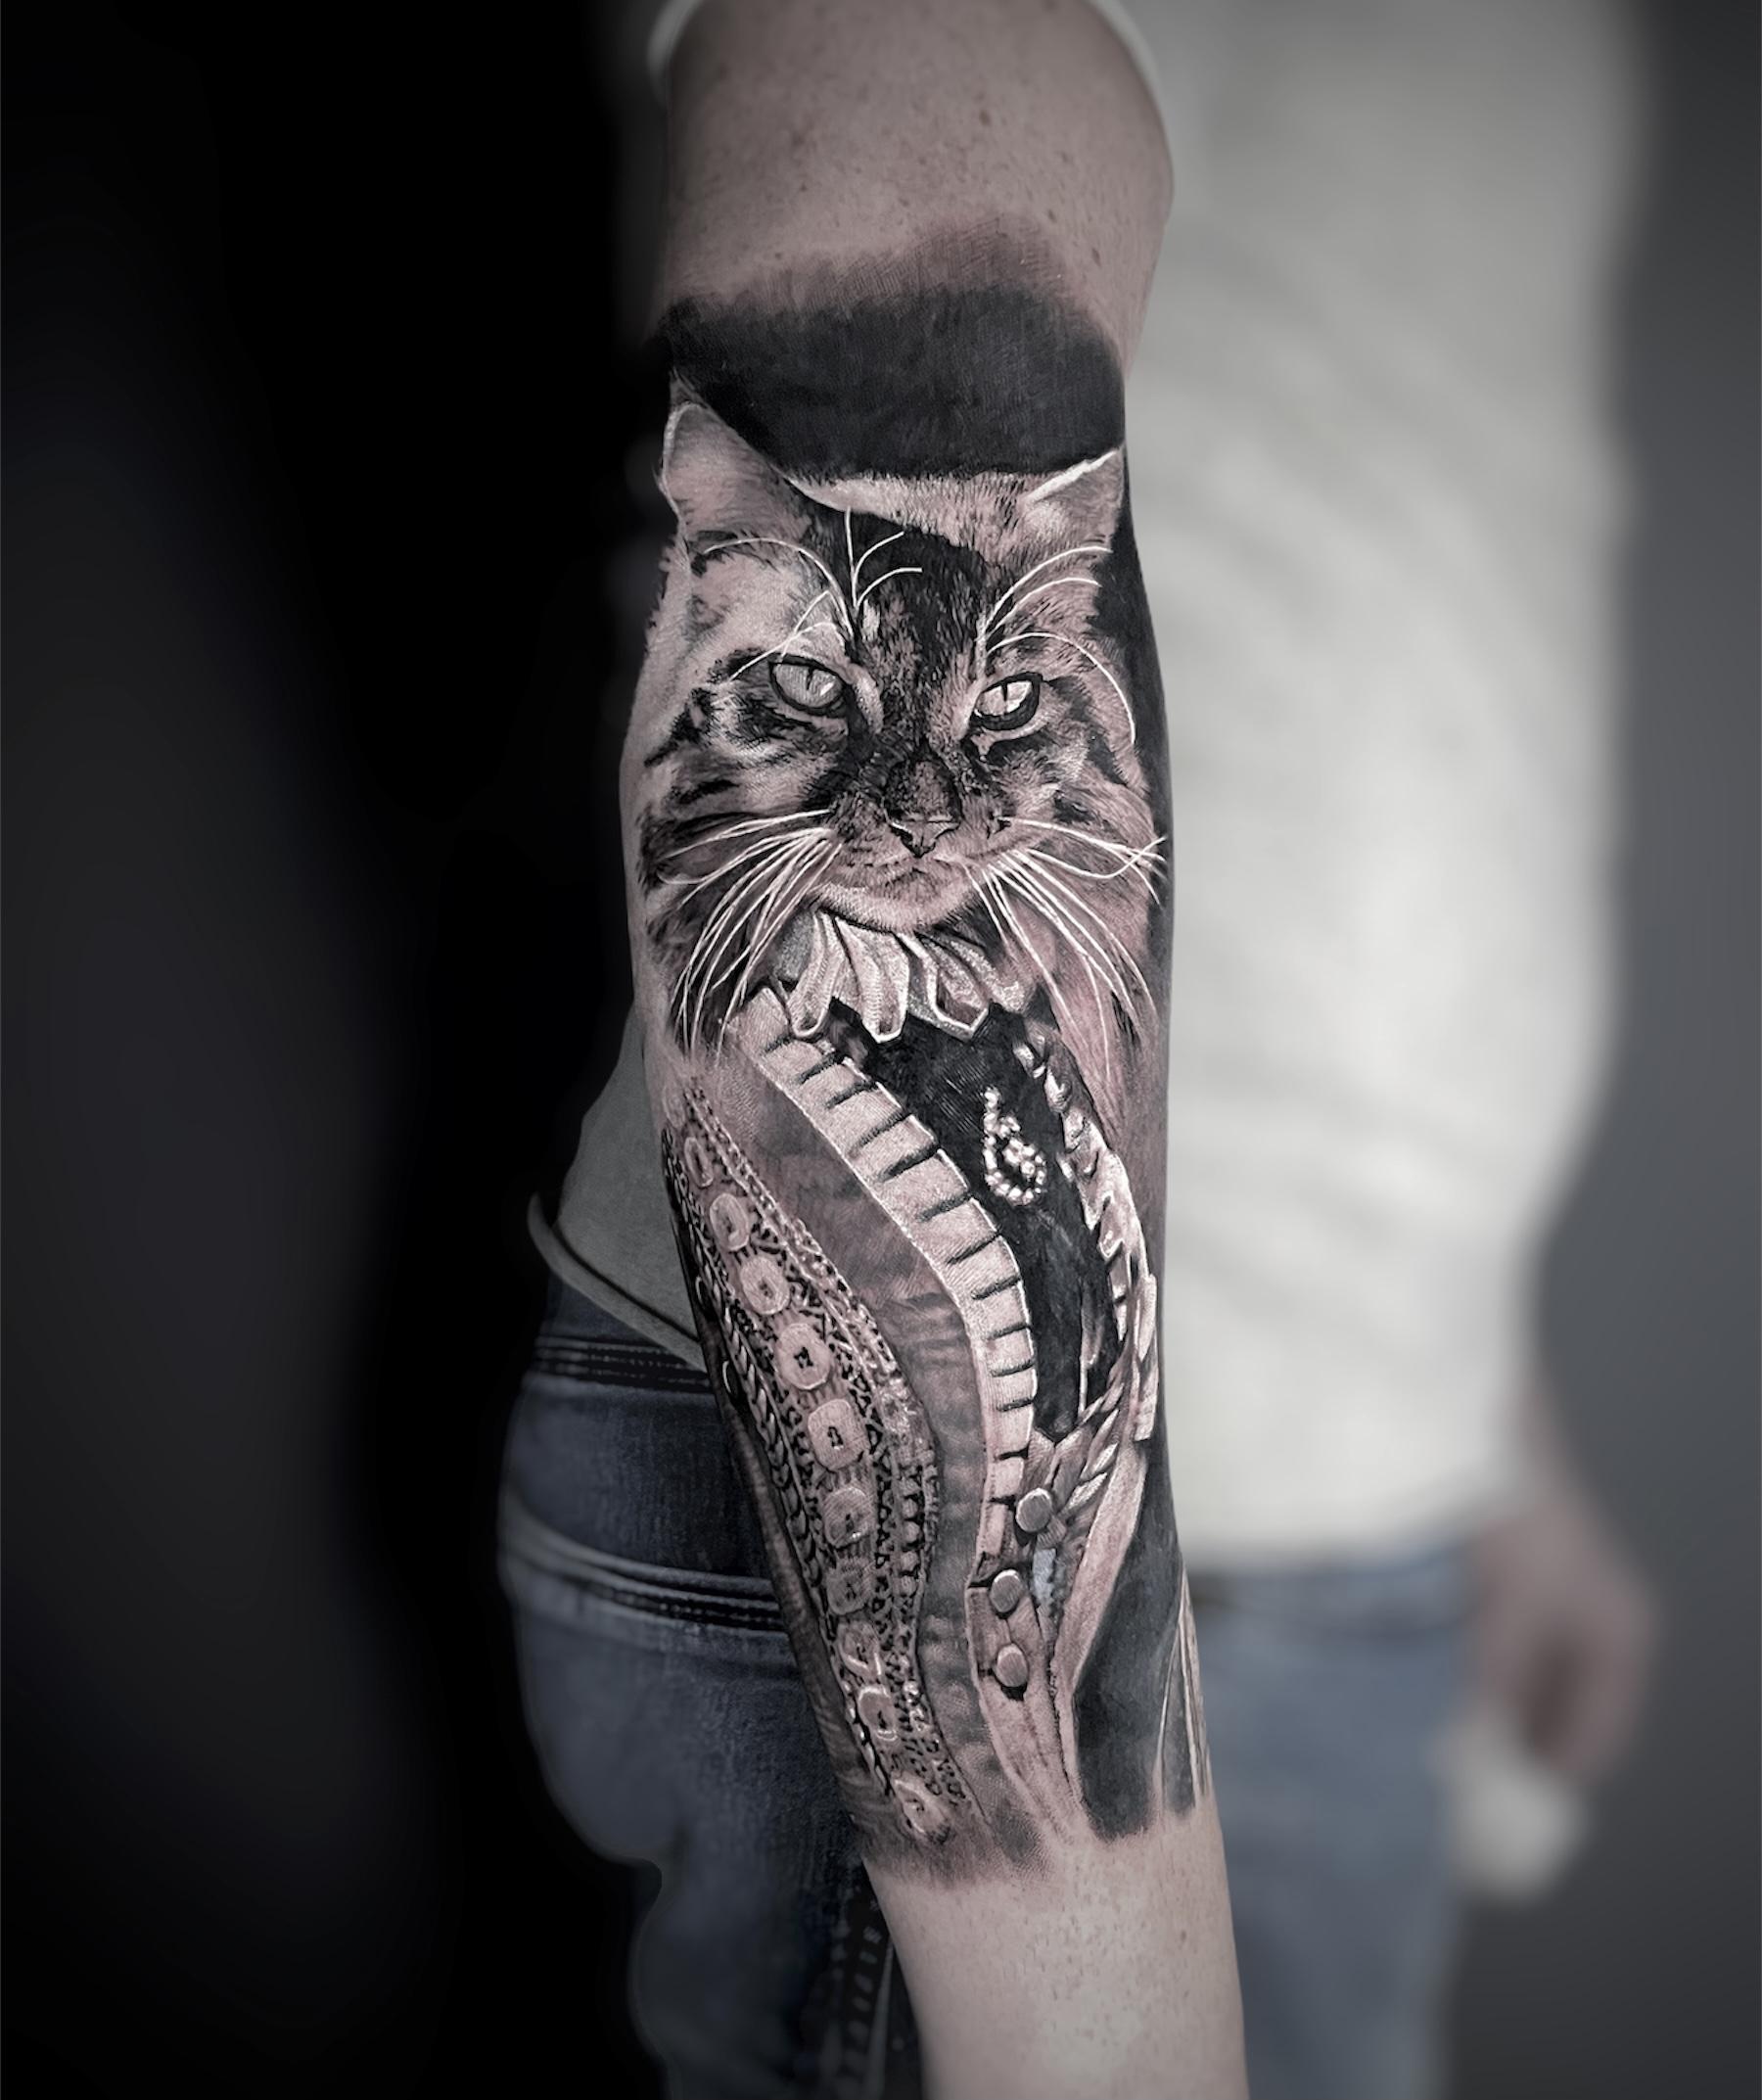 Matteo Paqualin Tatuatore – PhotoRoom_20210310_122813